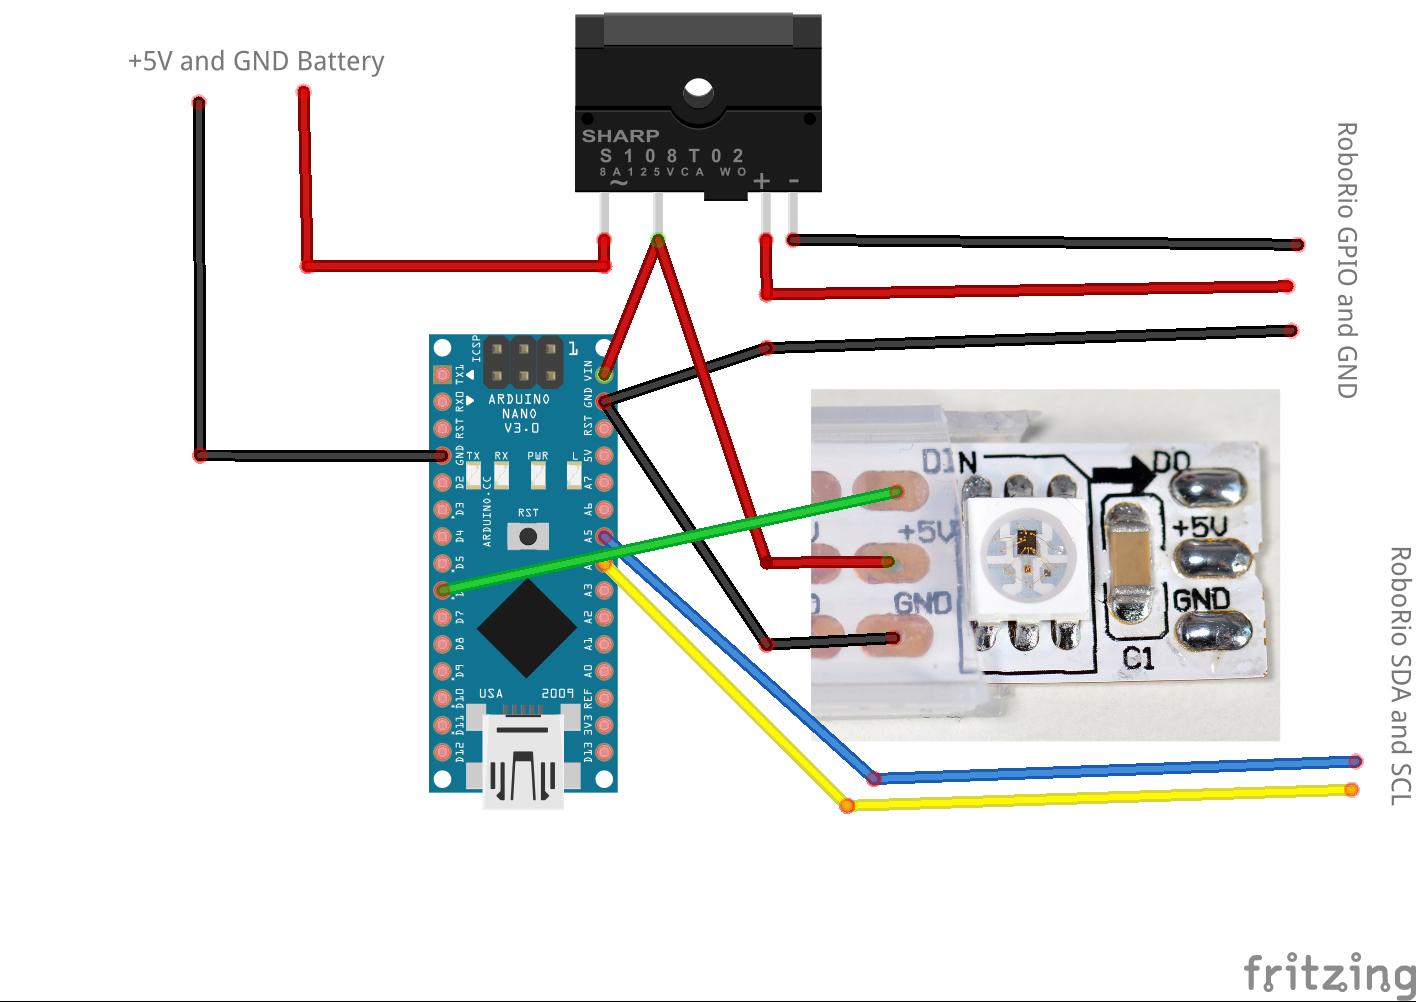 base_bb_TetrASYyRW?auto=compress%2Cformat&w=680&h=510&fit=max robotics led strip hackster io  at crackthecode.co